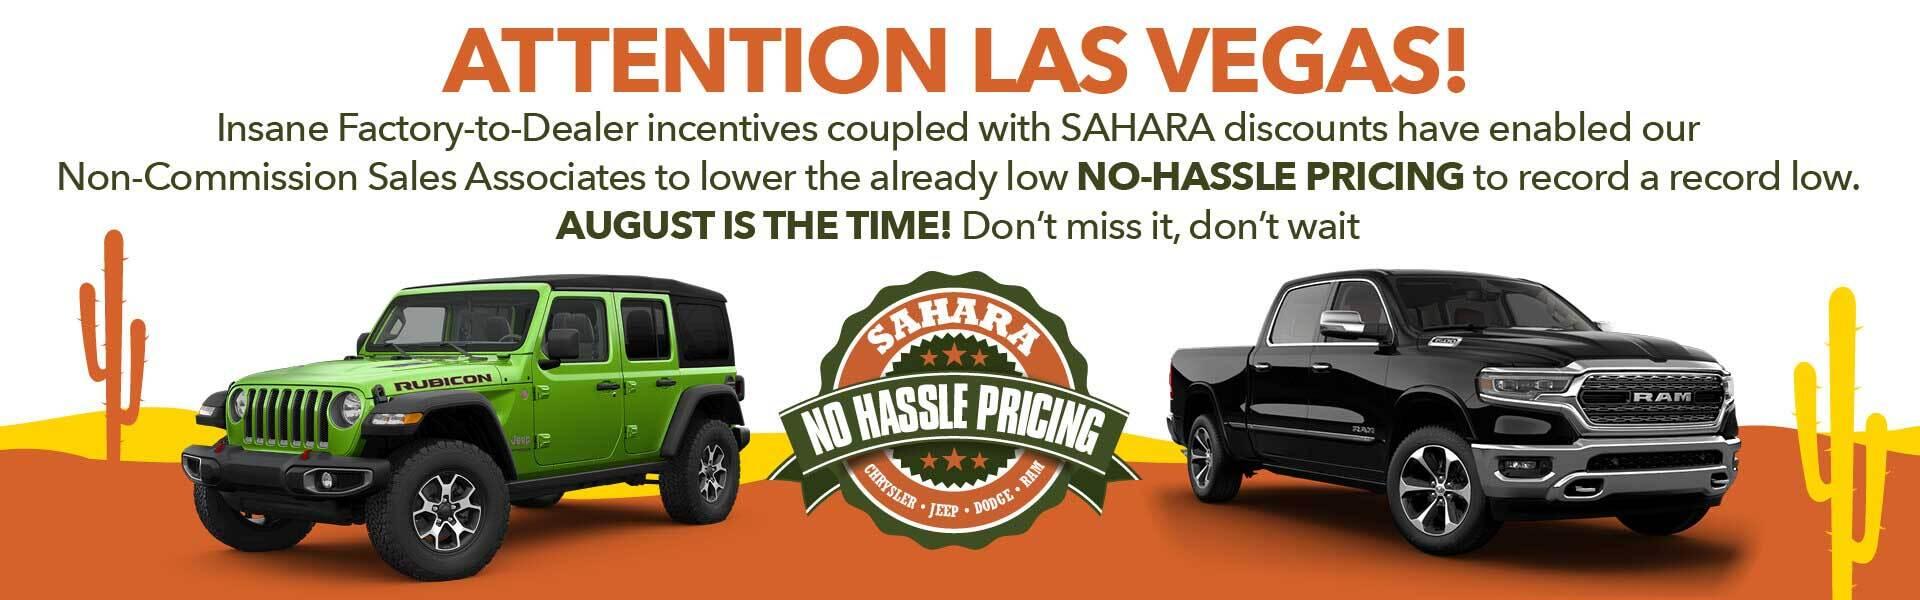 Jeep Dealership Las Vegas >> Jeep Dealer Las Vegas Nevada Foto Jeep And Wallpaper Hd